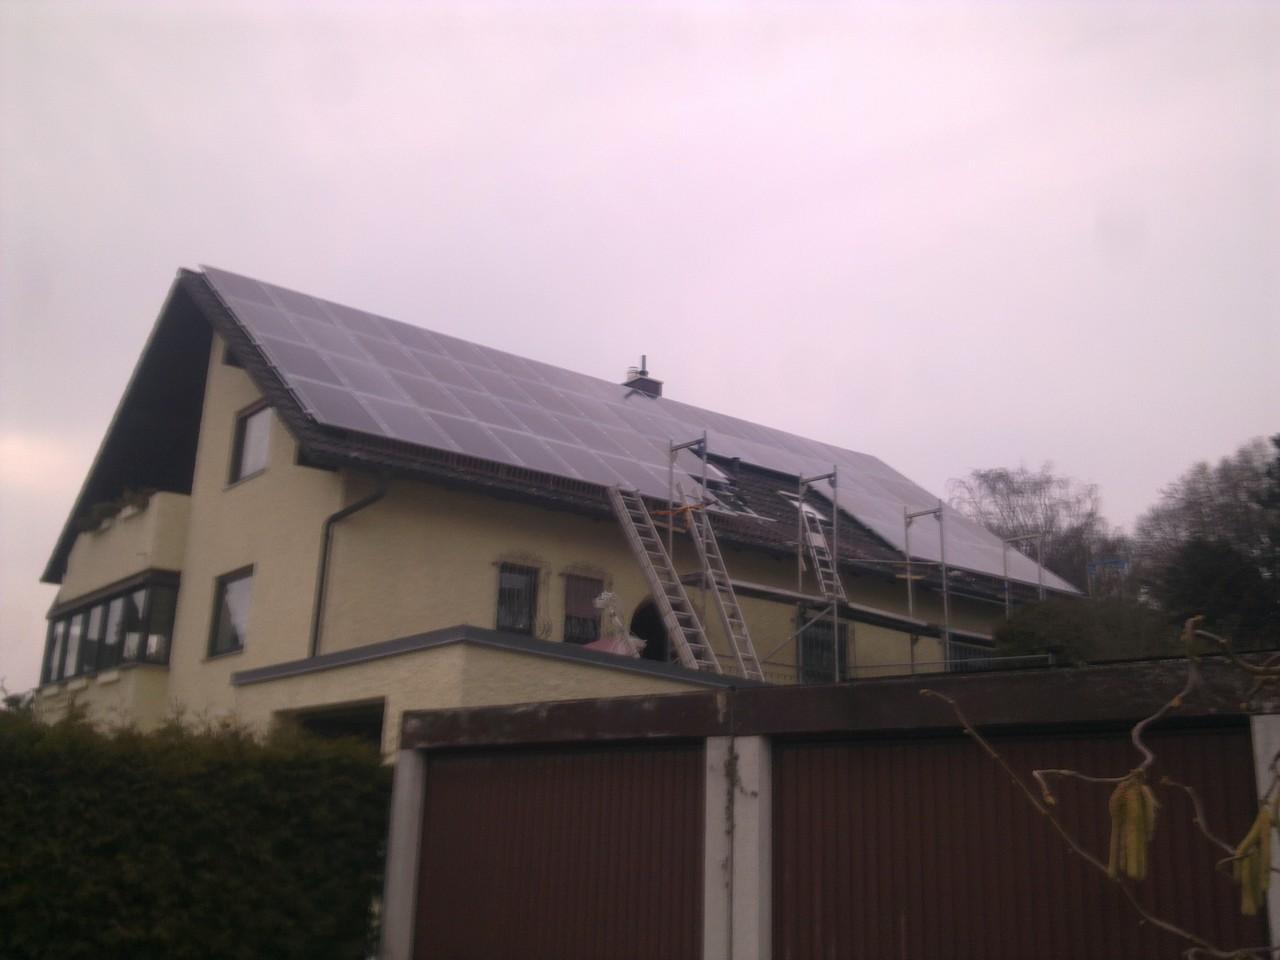 15 kWp Photovoltaikanlage in 93055 Regensburg